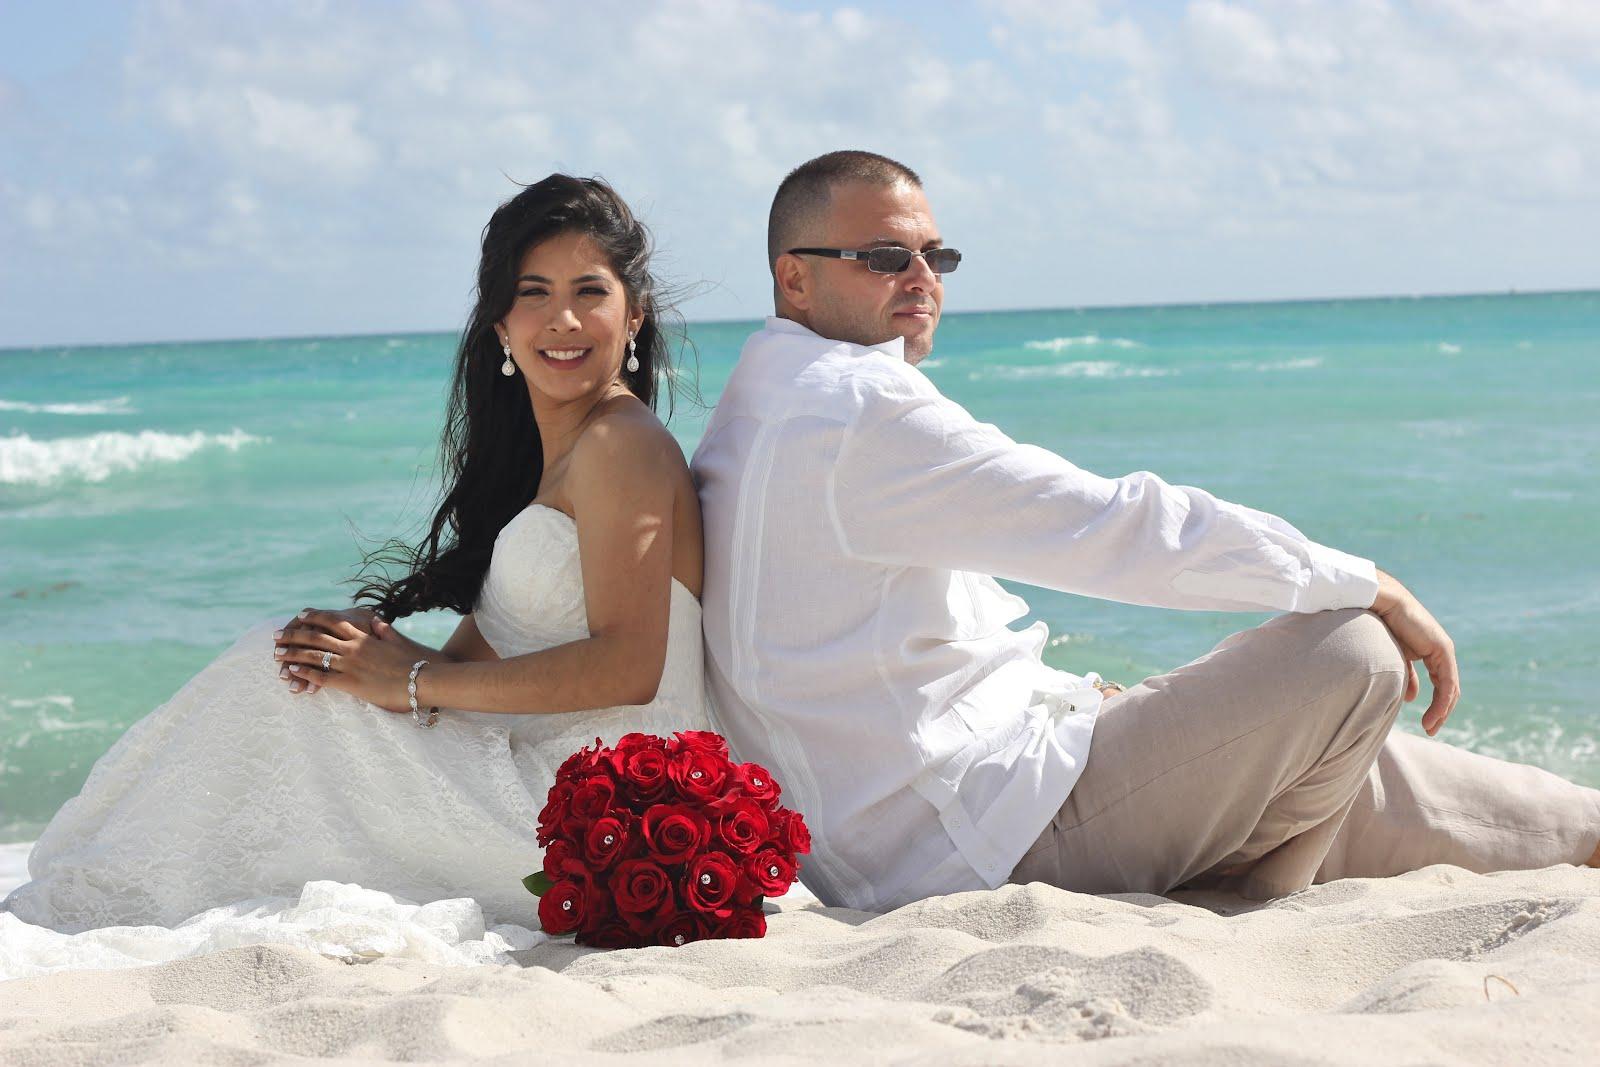 Affordable Beach Weddings! 305-793-4387: Diana & Mario